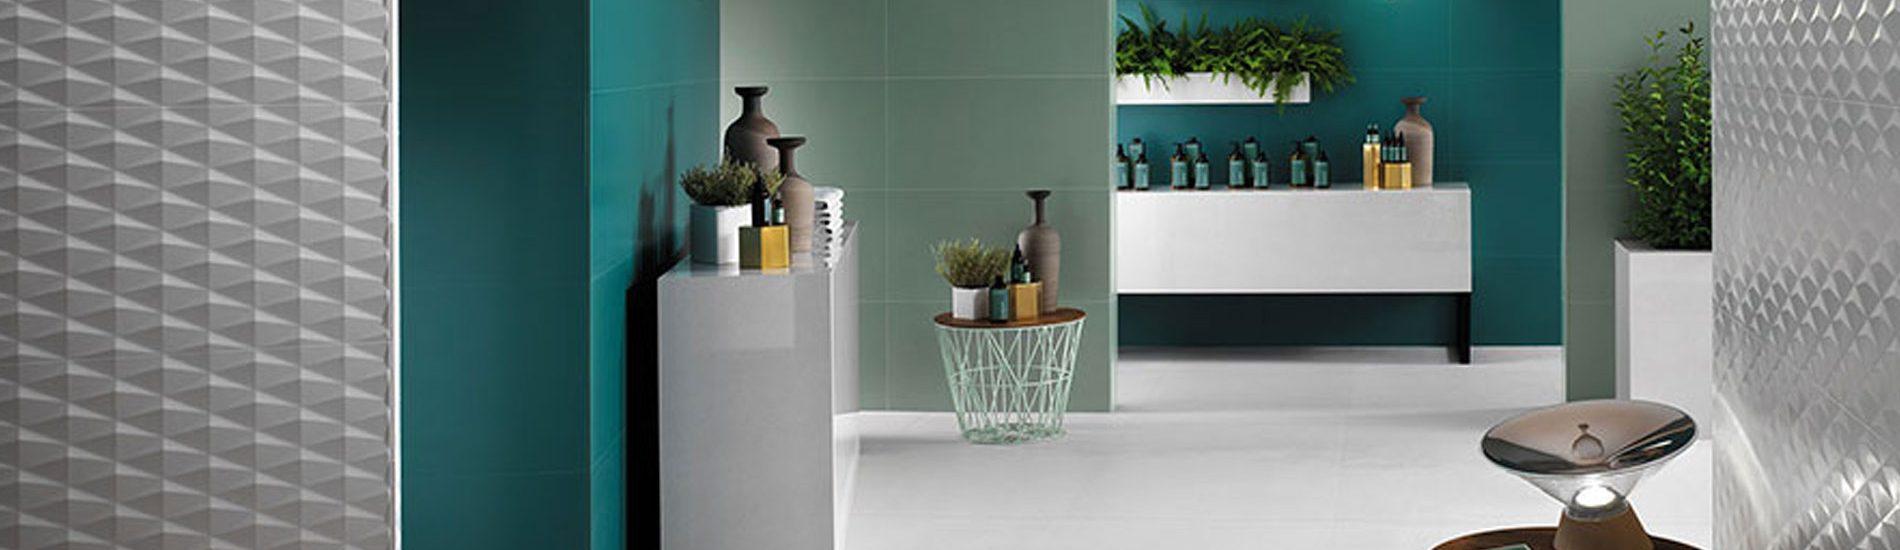 banner-atlas-concorde-arkshade-concrete-italian-floor-wall-tile